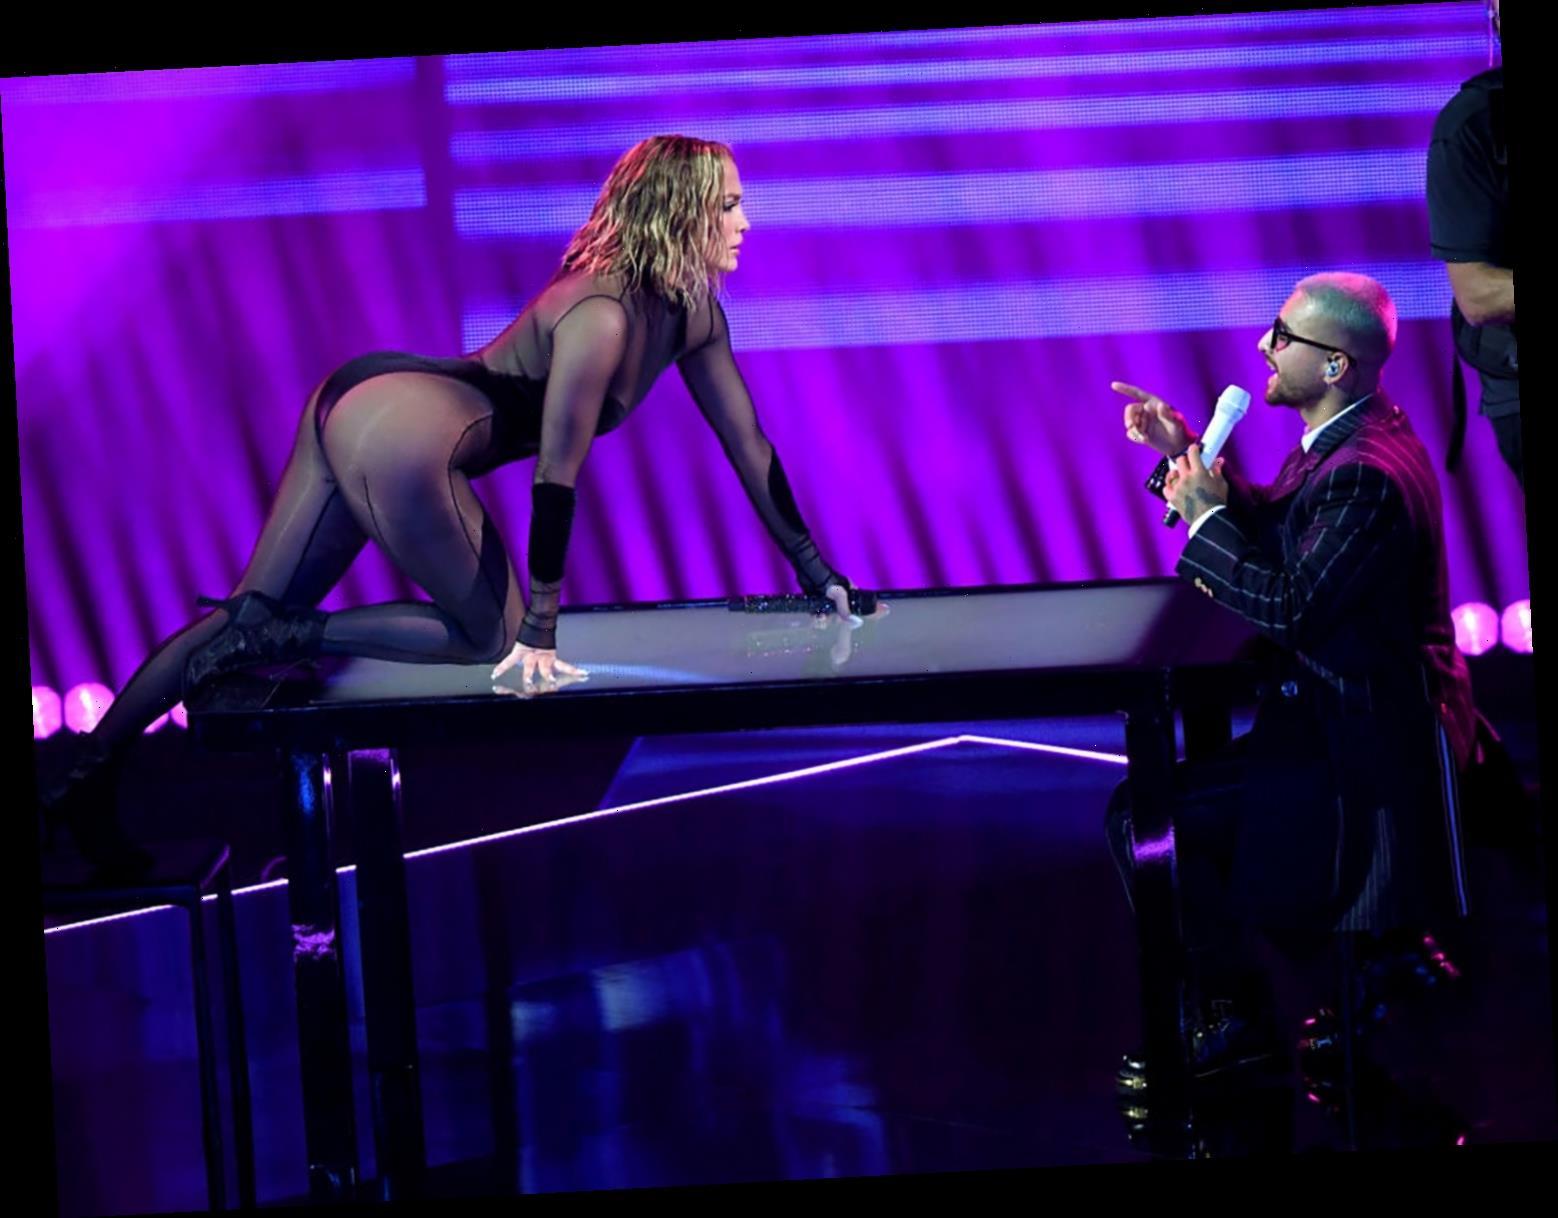 Jennifer Lopez and Maluma Give Steamy Performance of 'Pa' Ti' and 'Lonely' at 2020 AMAs